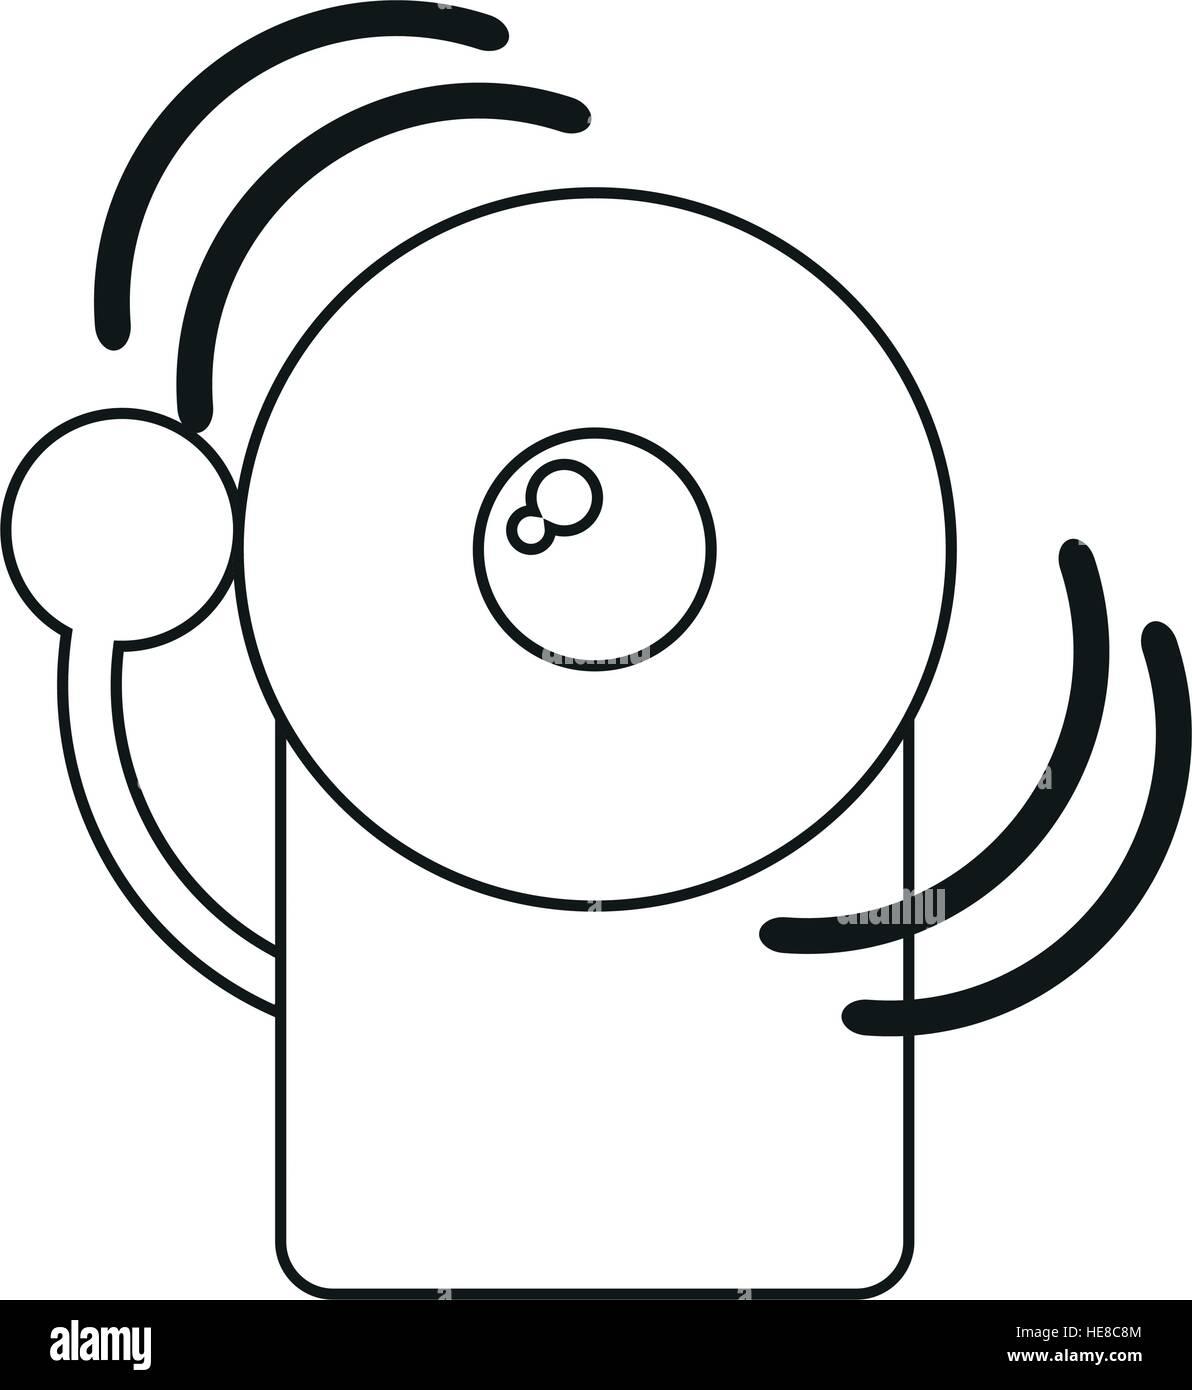 alarm fire emergency alert icon line - Stock Image